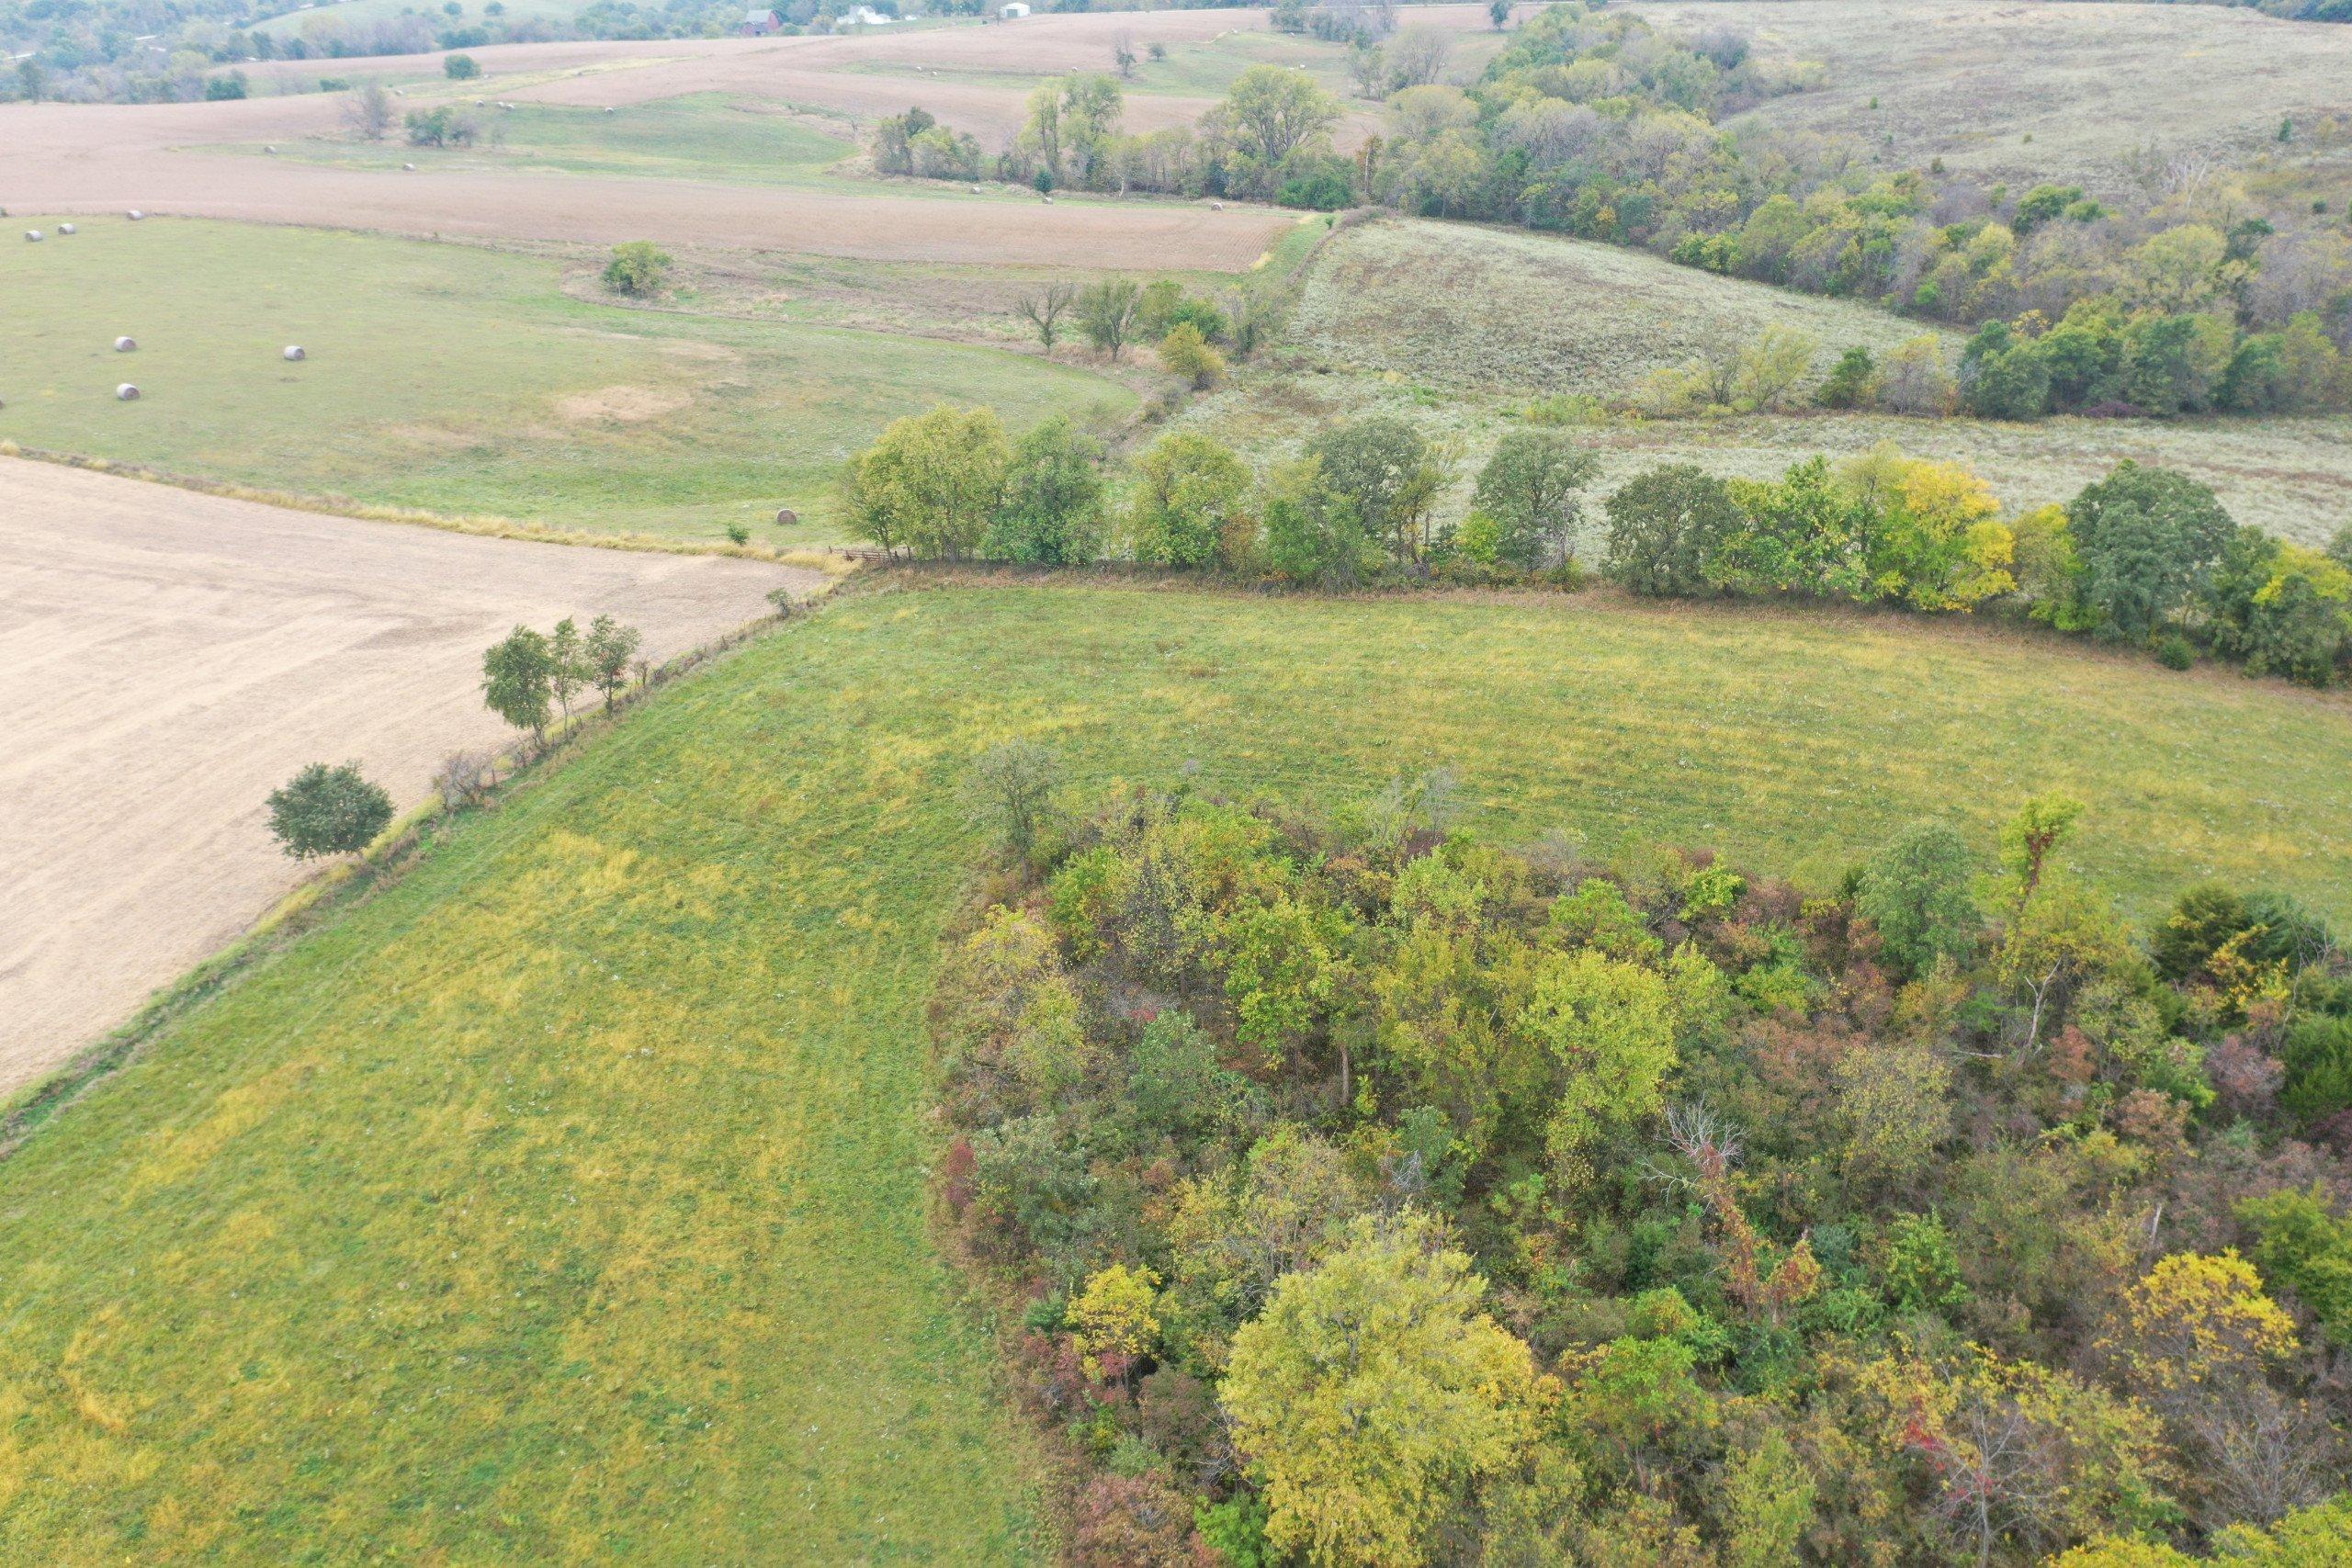 land-warren-county-iowa-200-acres-listing-number-15810-DJI_0603-1.jpg